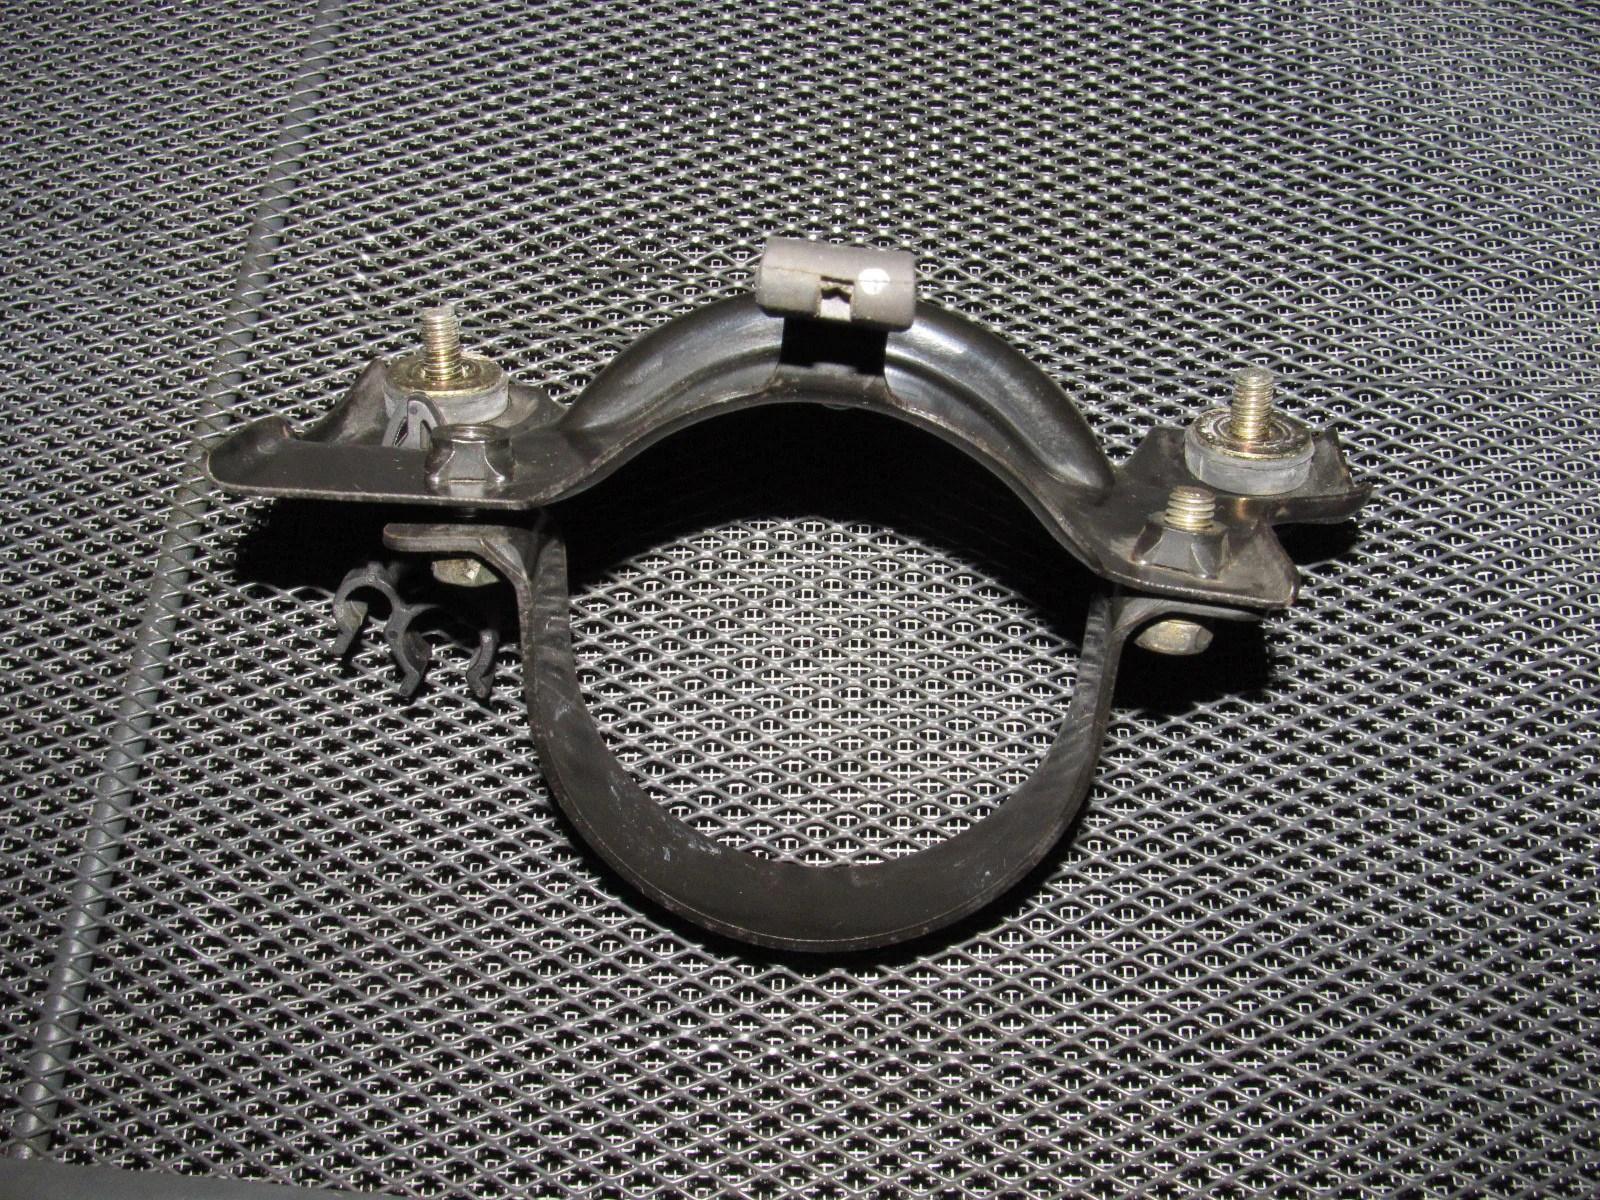 92 93 94 95 96 honda prelude oem fuel filter bracket [ 1600 x 1200 Pixel ]